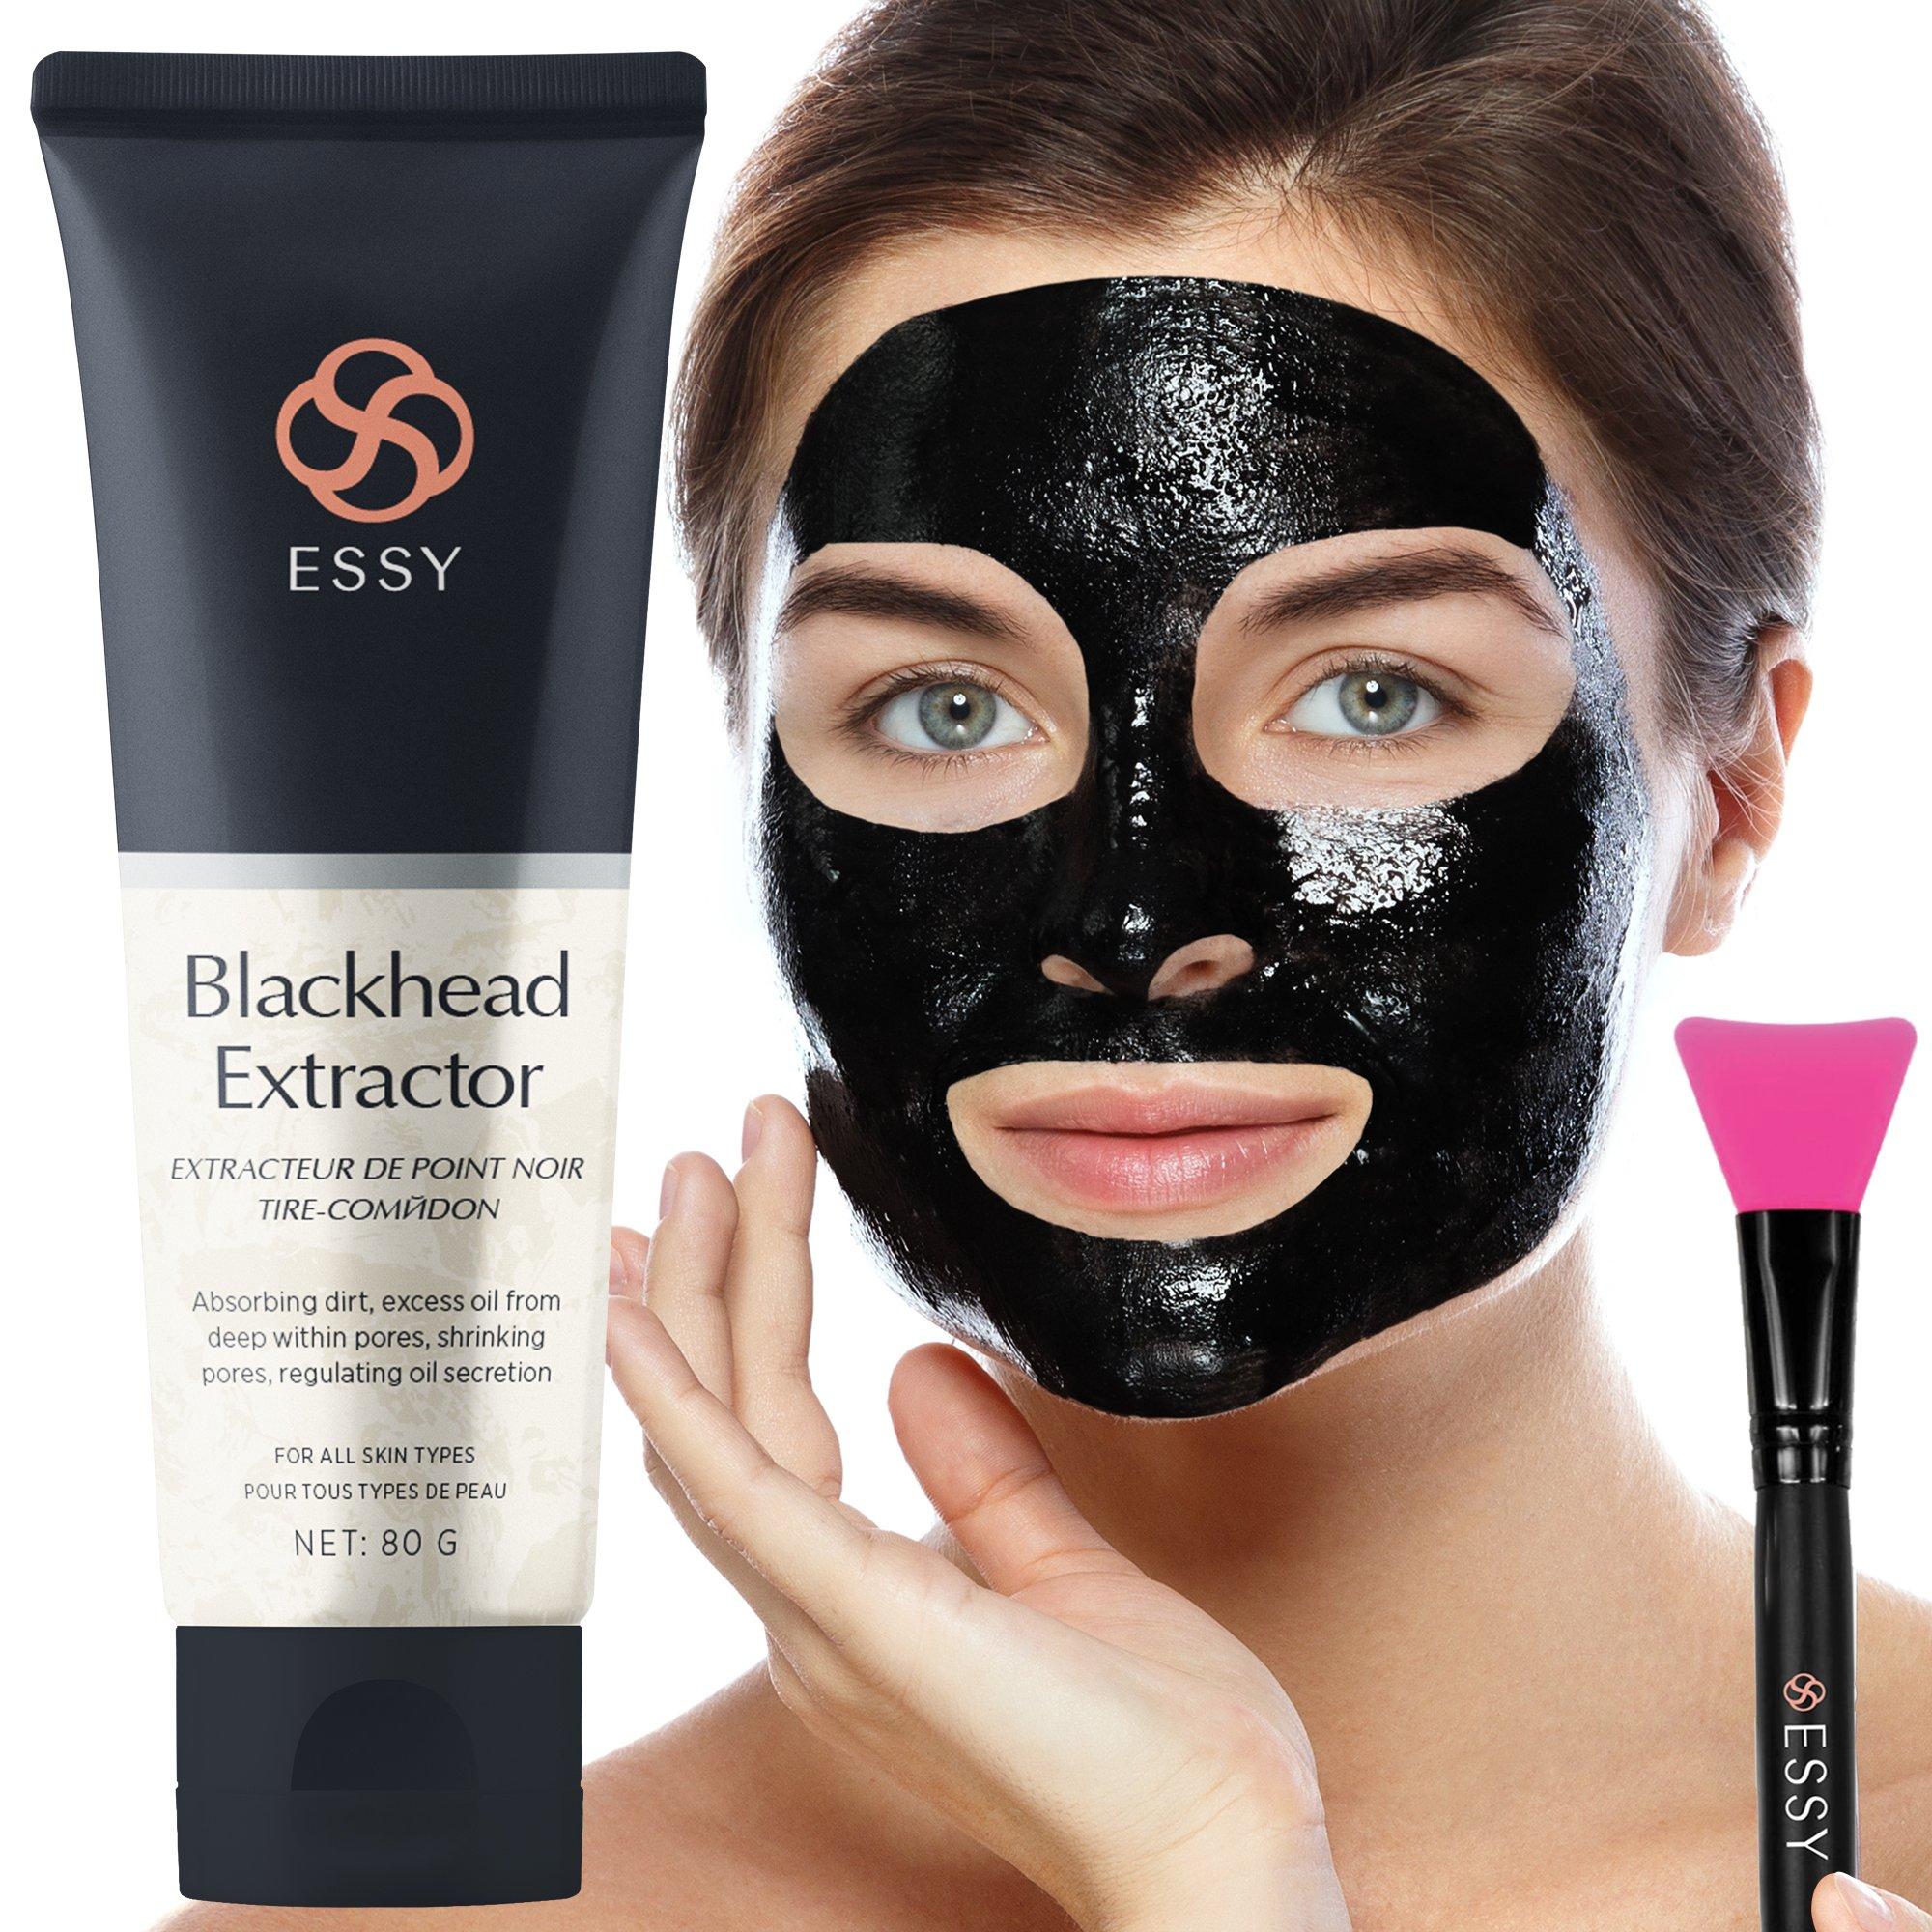 Essy - Black Peel-off Mask, Charcoal Blackhead Remover Mask